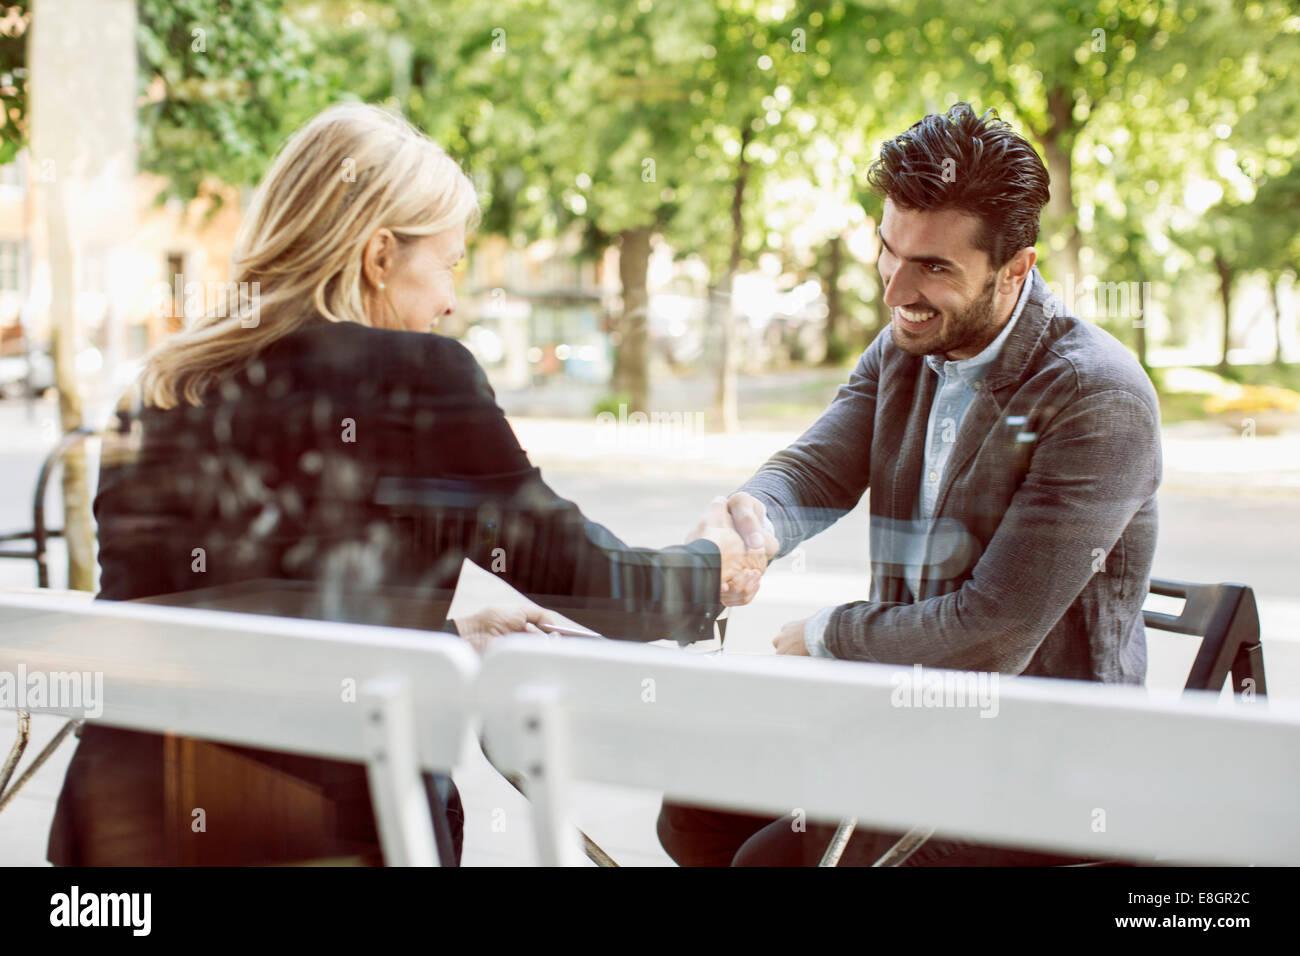 Business partners shaking hands at sidewalk cafe - Stock Image